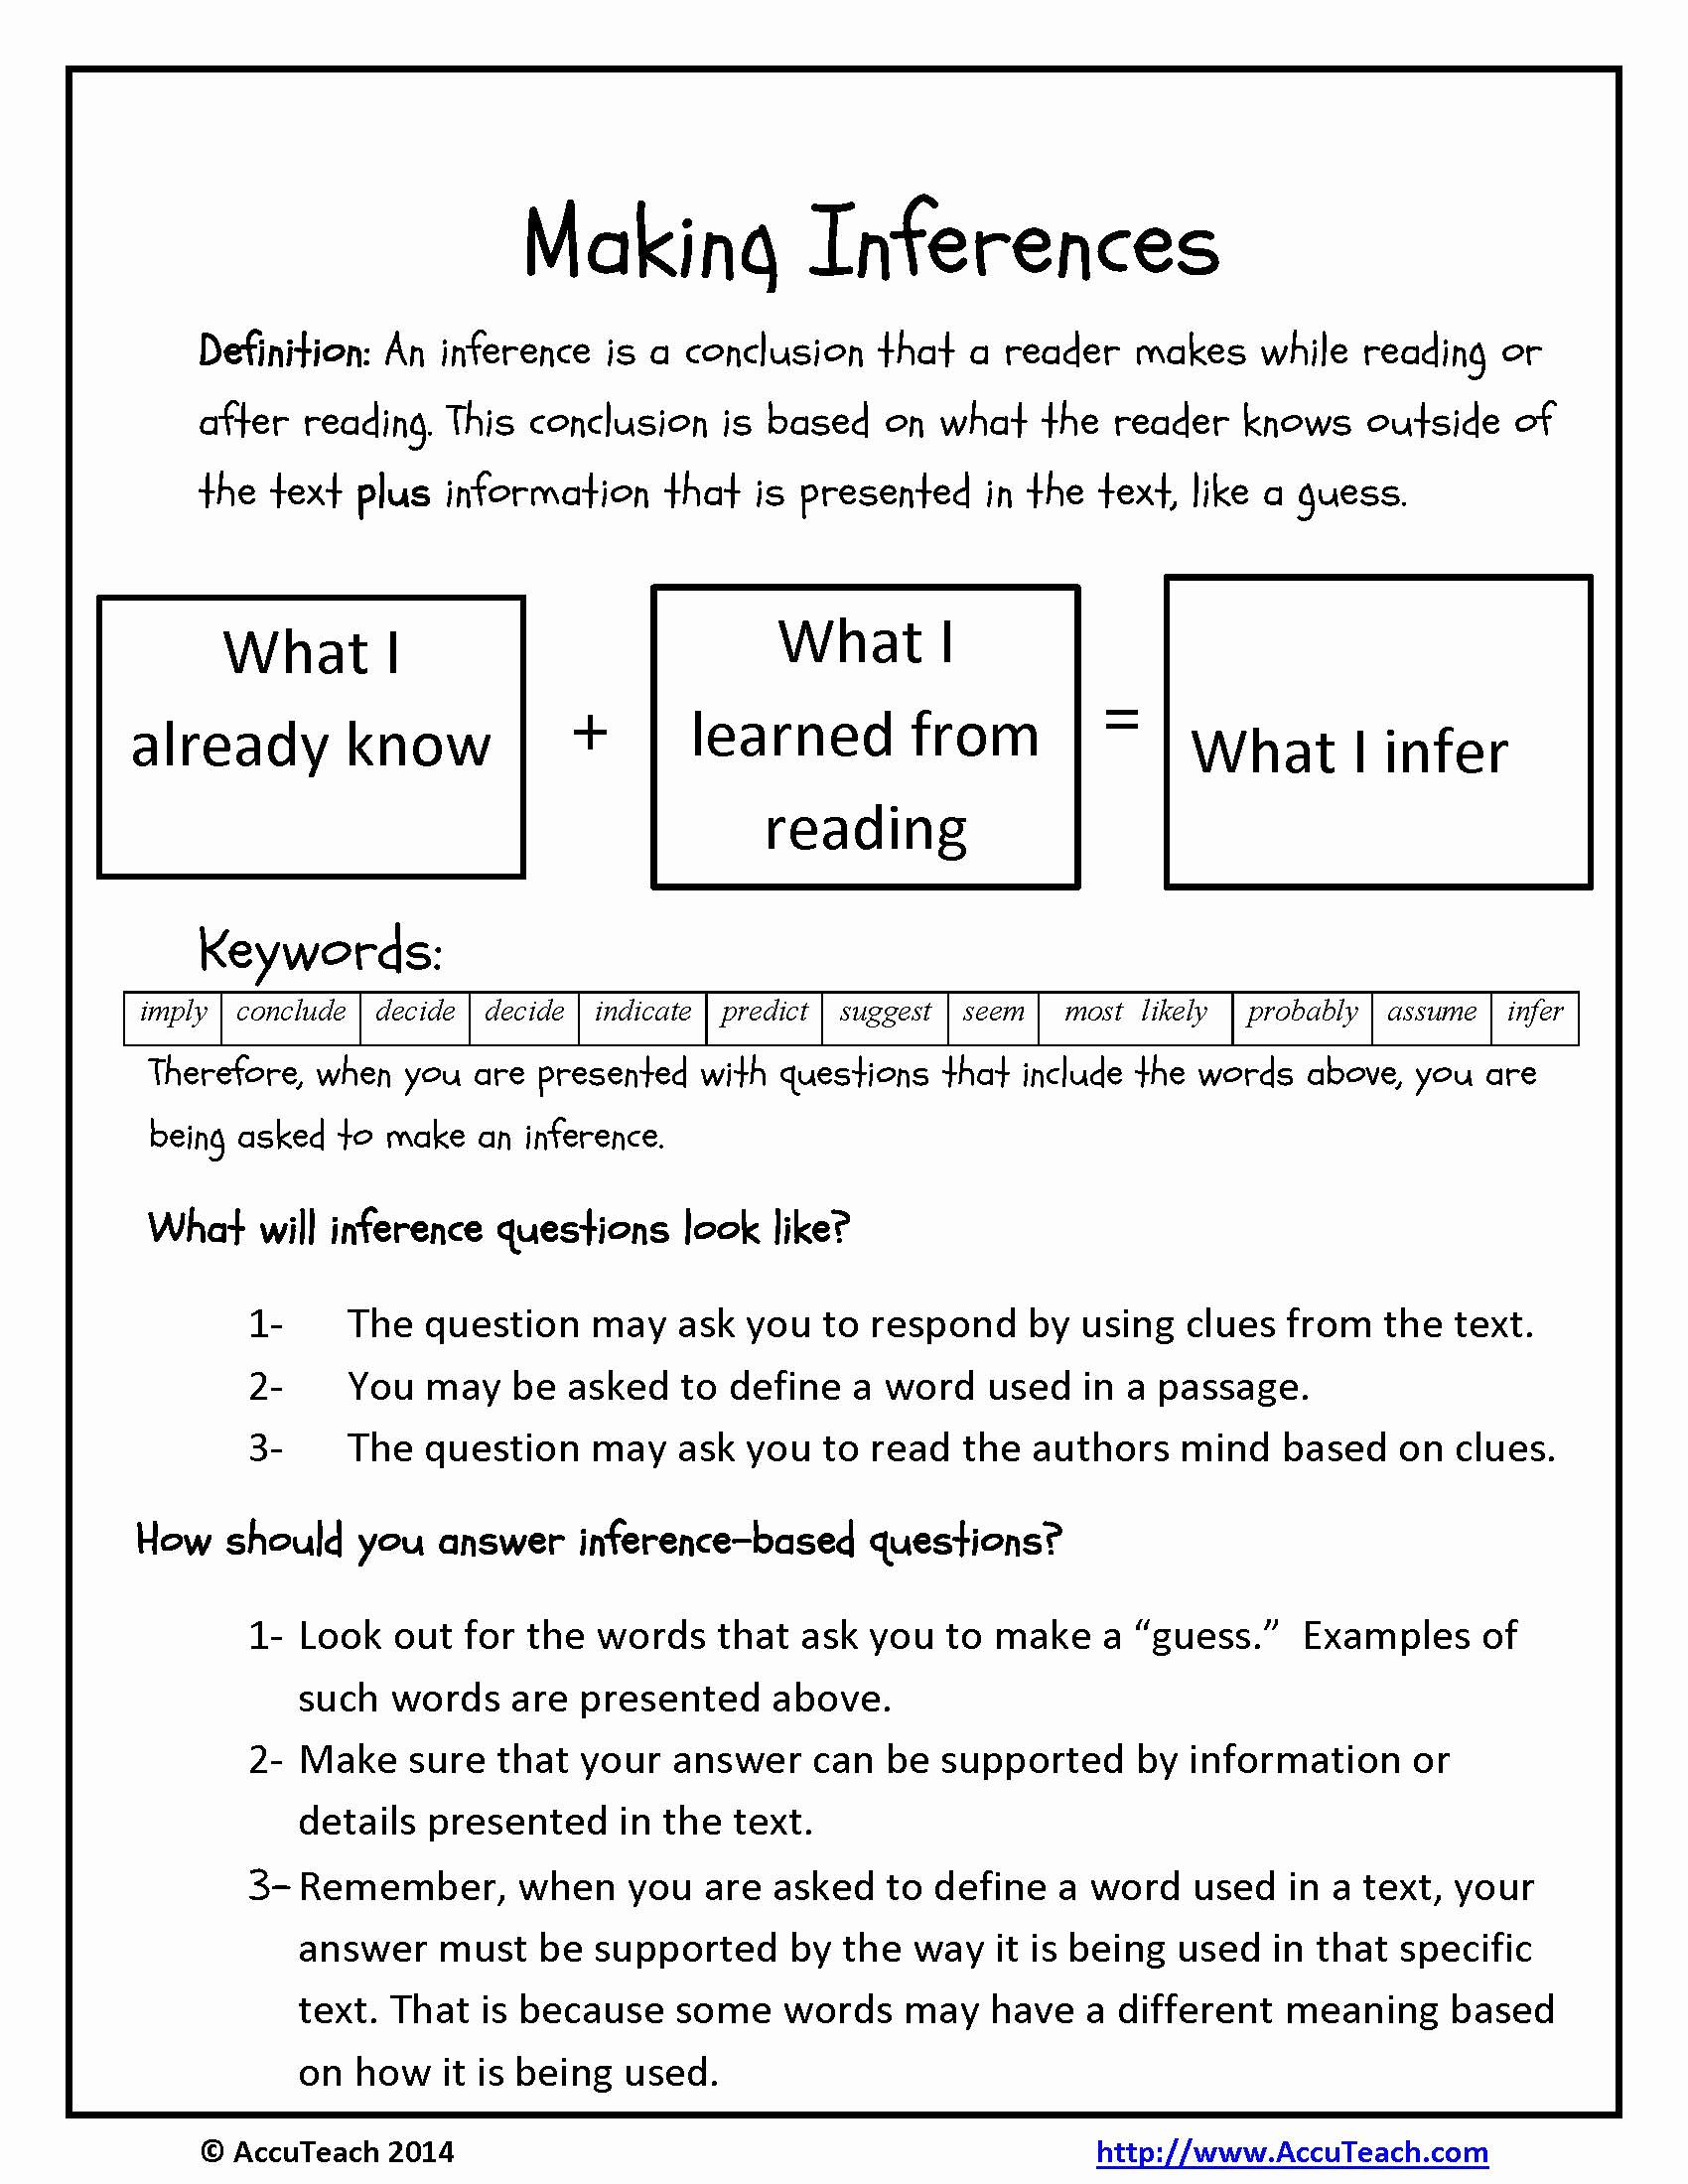 Making Inferences Worksheet 4th Grade Beautiful 20 Inference Worksheets 4th Grade